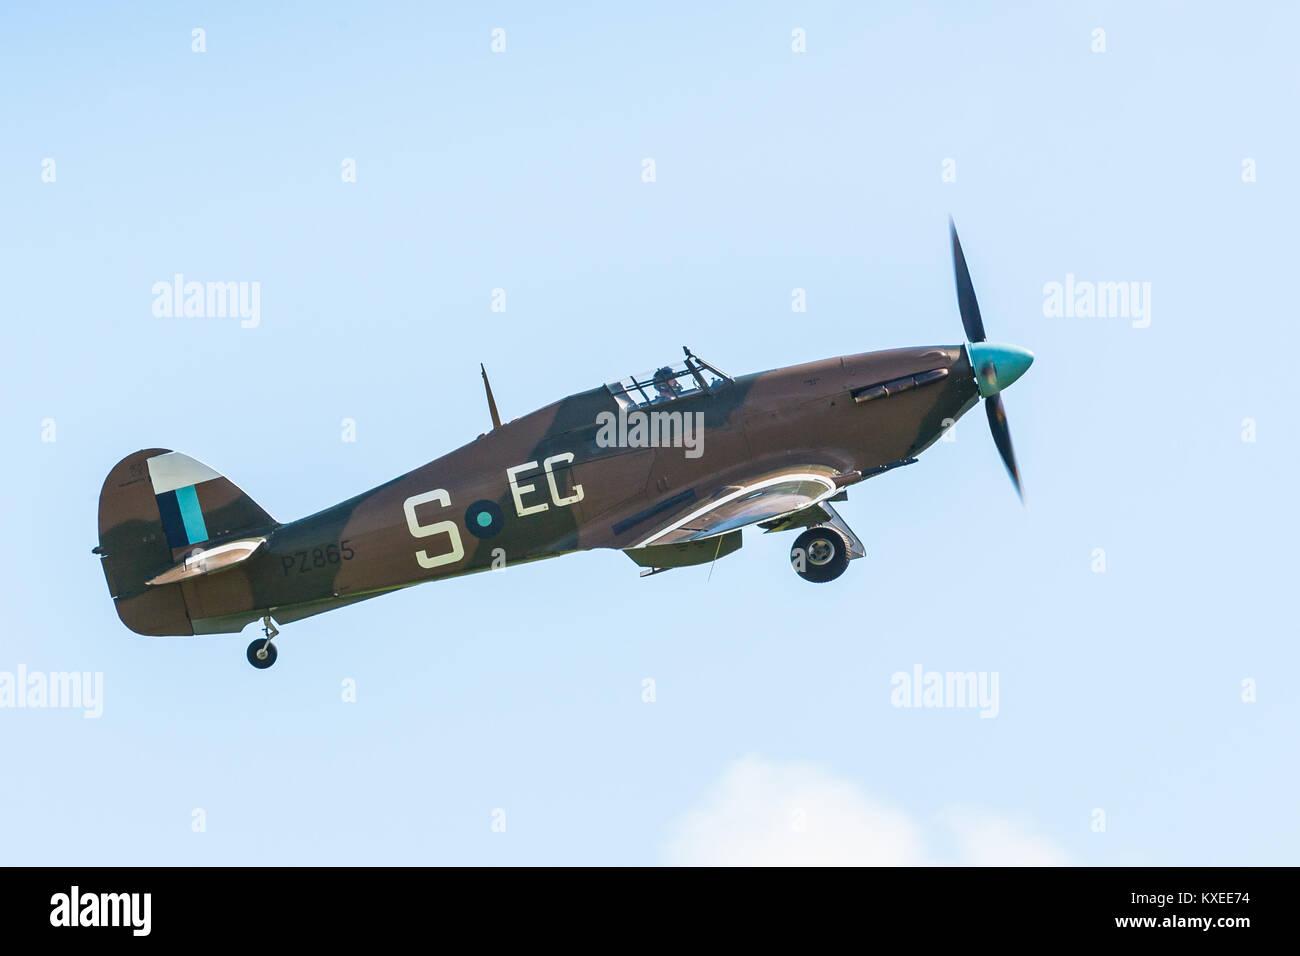 Hurricane PZ865 (Mk IIc) Battle of Britain 75th anniversary at Goodwood (RAF Westhampnett) - Stock Image